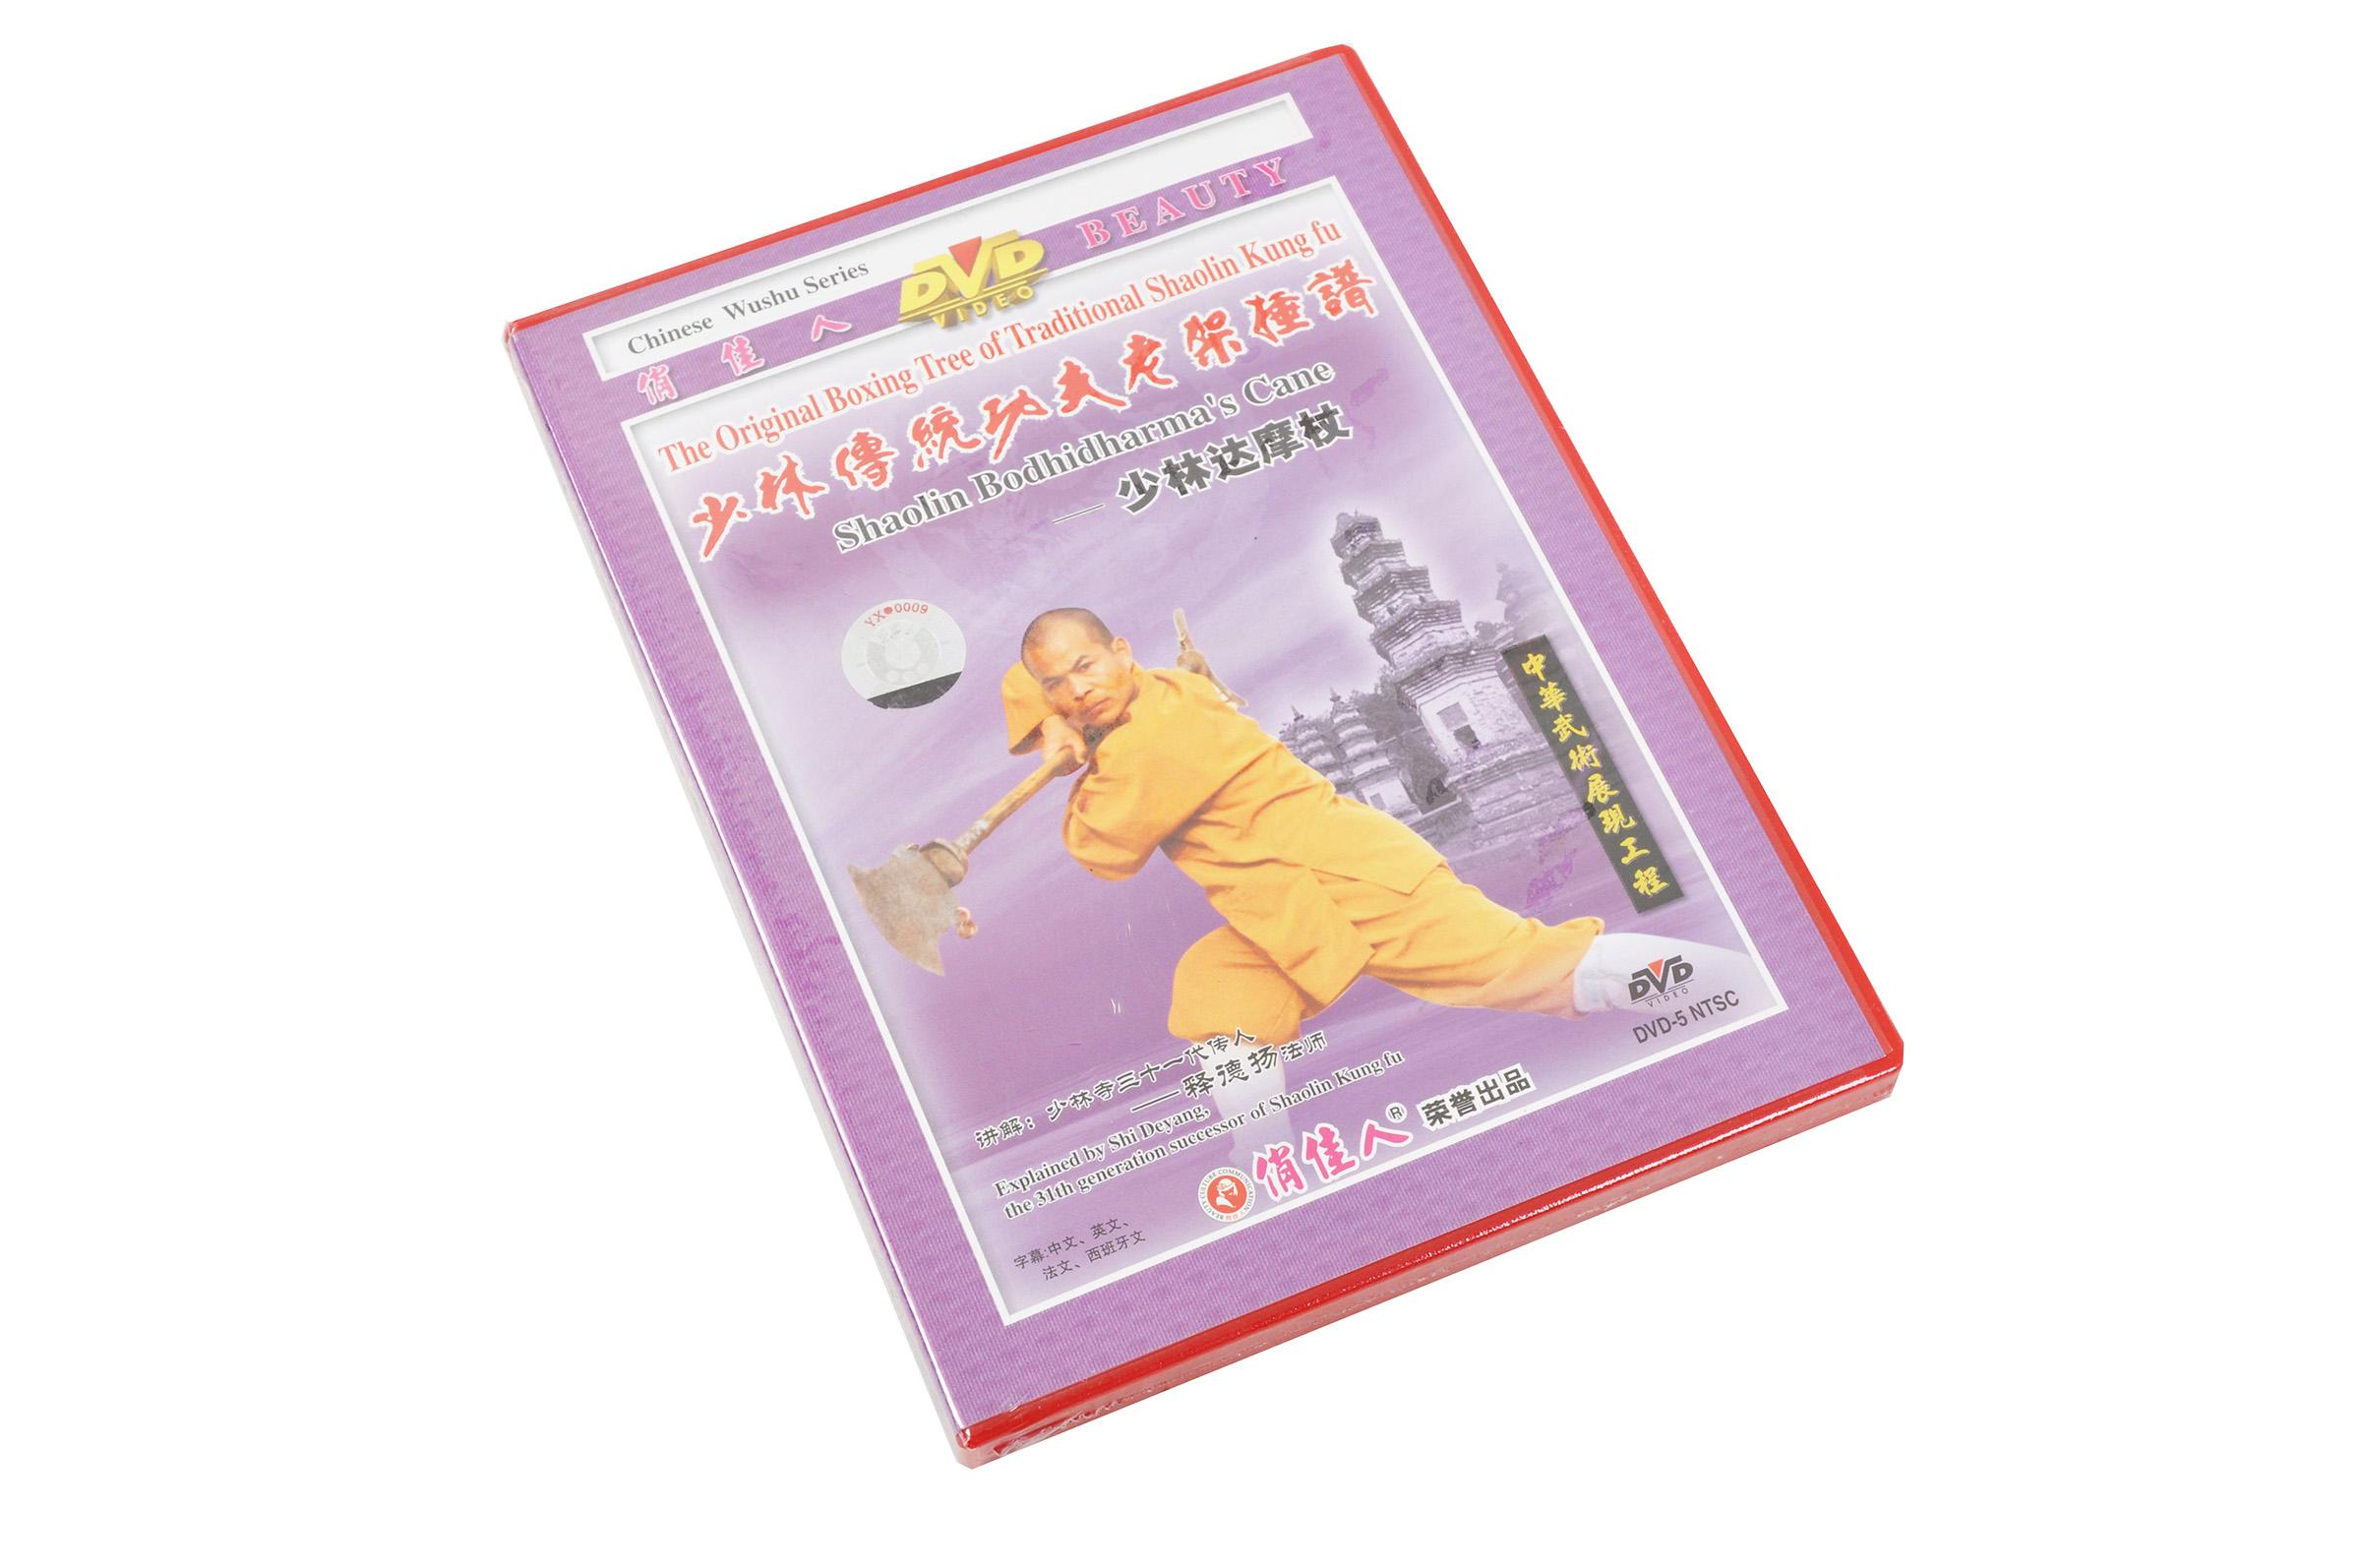 [DVD] Bâton Bodhi-dharma